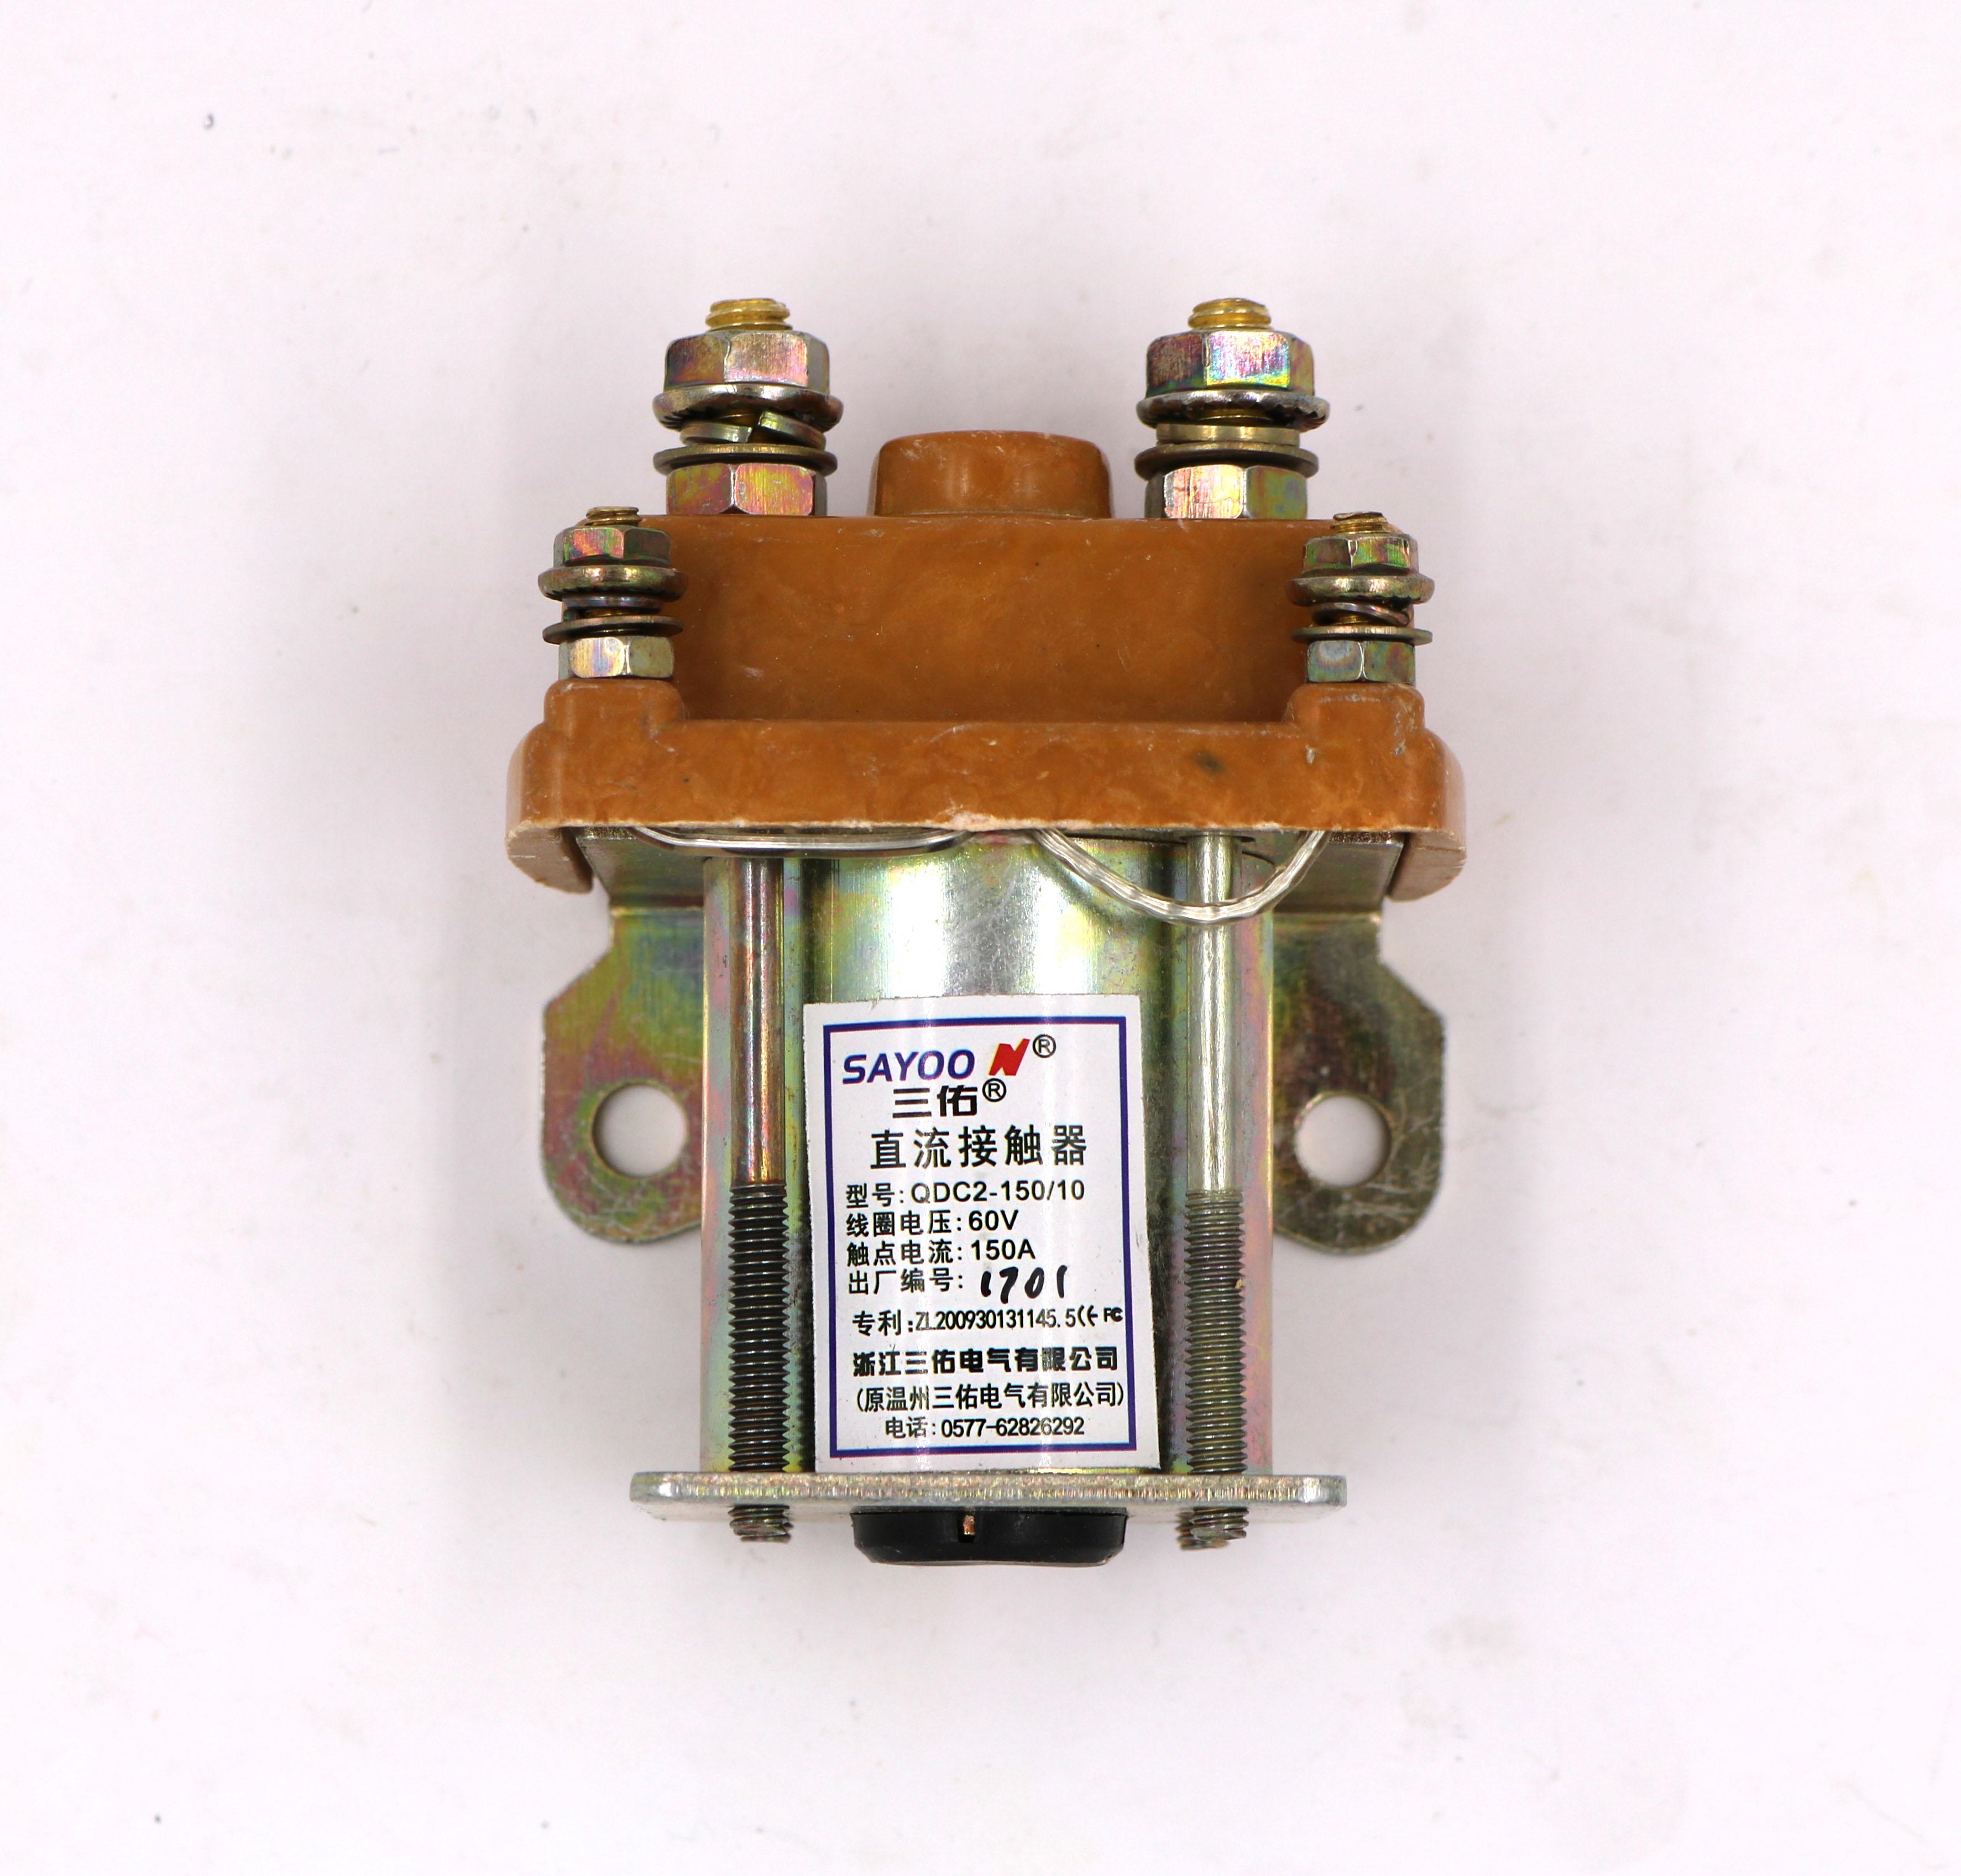 Разнообразные запчасти/аксессуары для электромобилей Xin Fu Yuan car accessories 48 24v 36V 48V 60V 72V150A